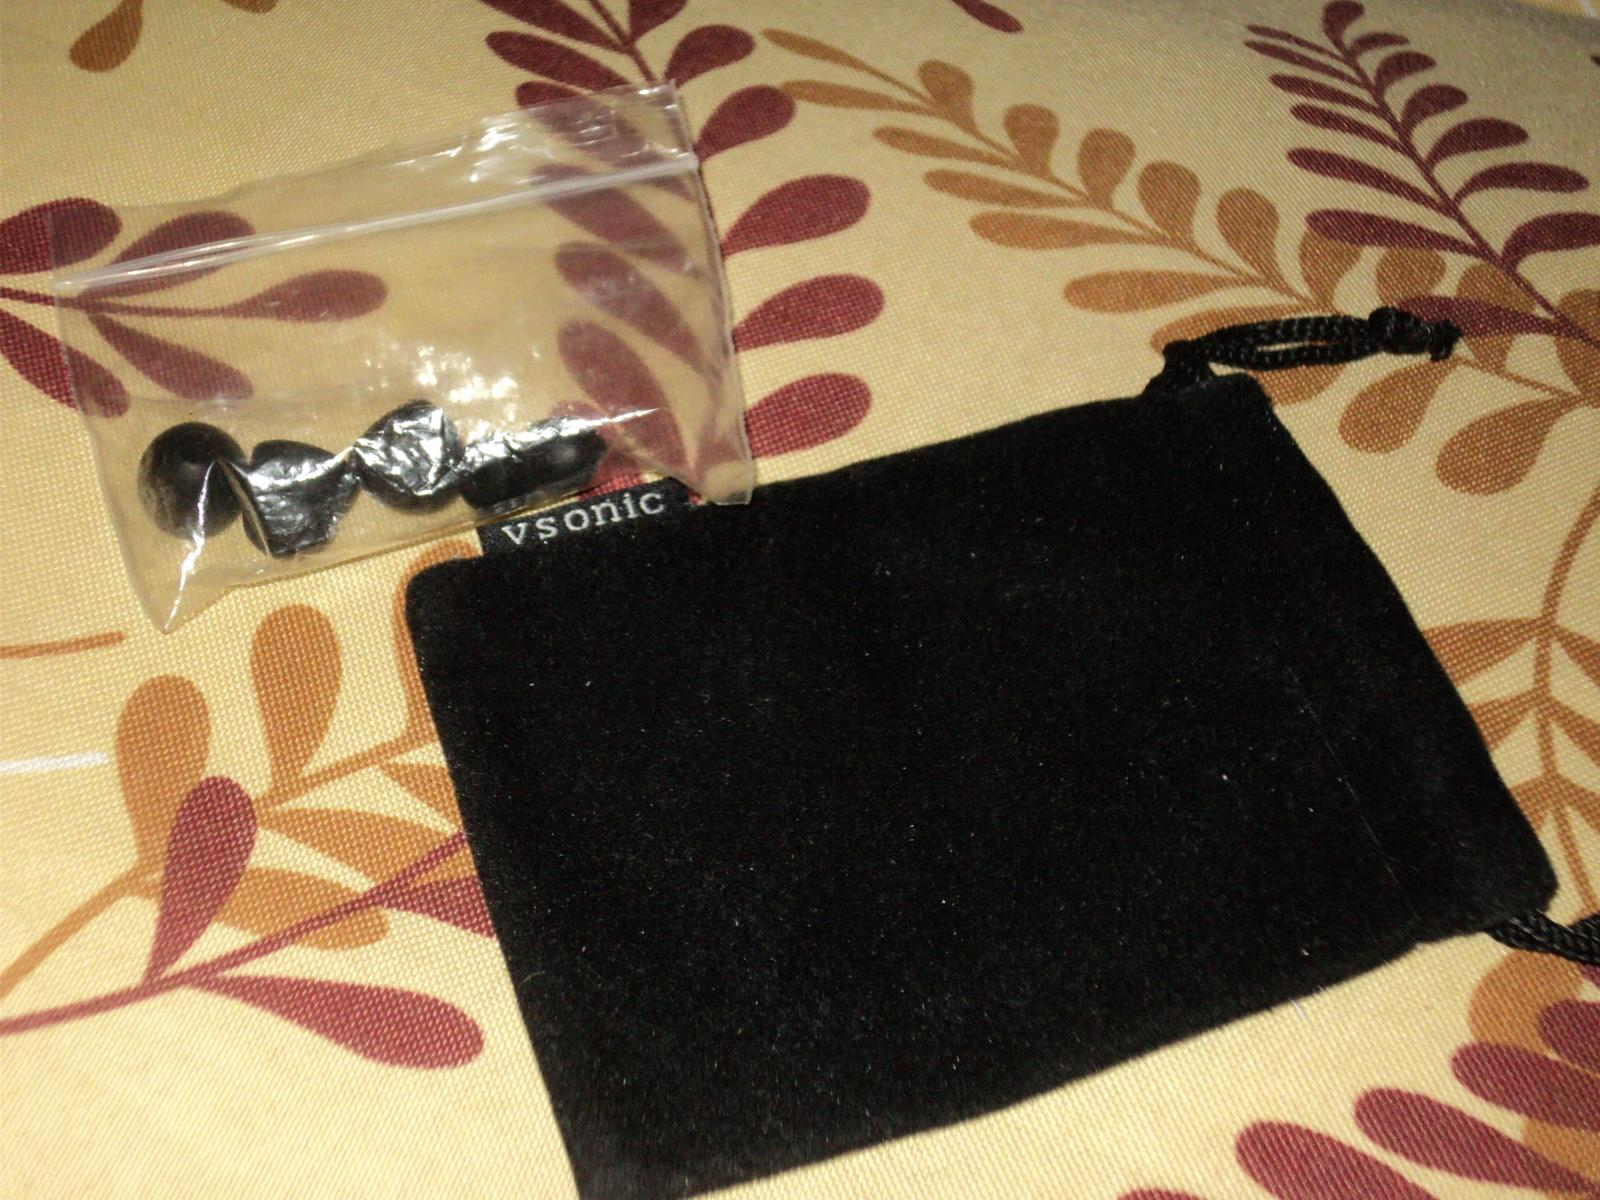 Vsonic accessories